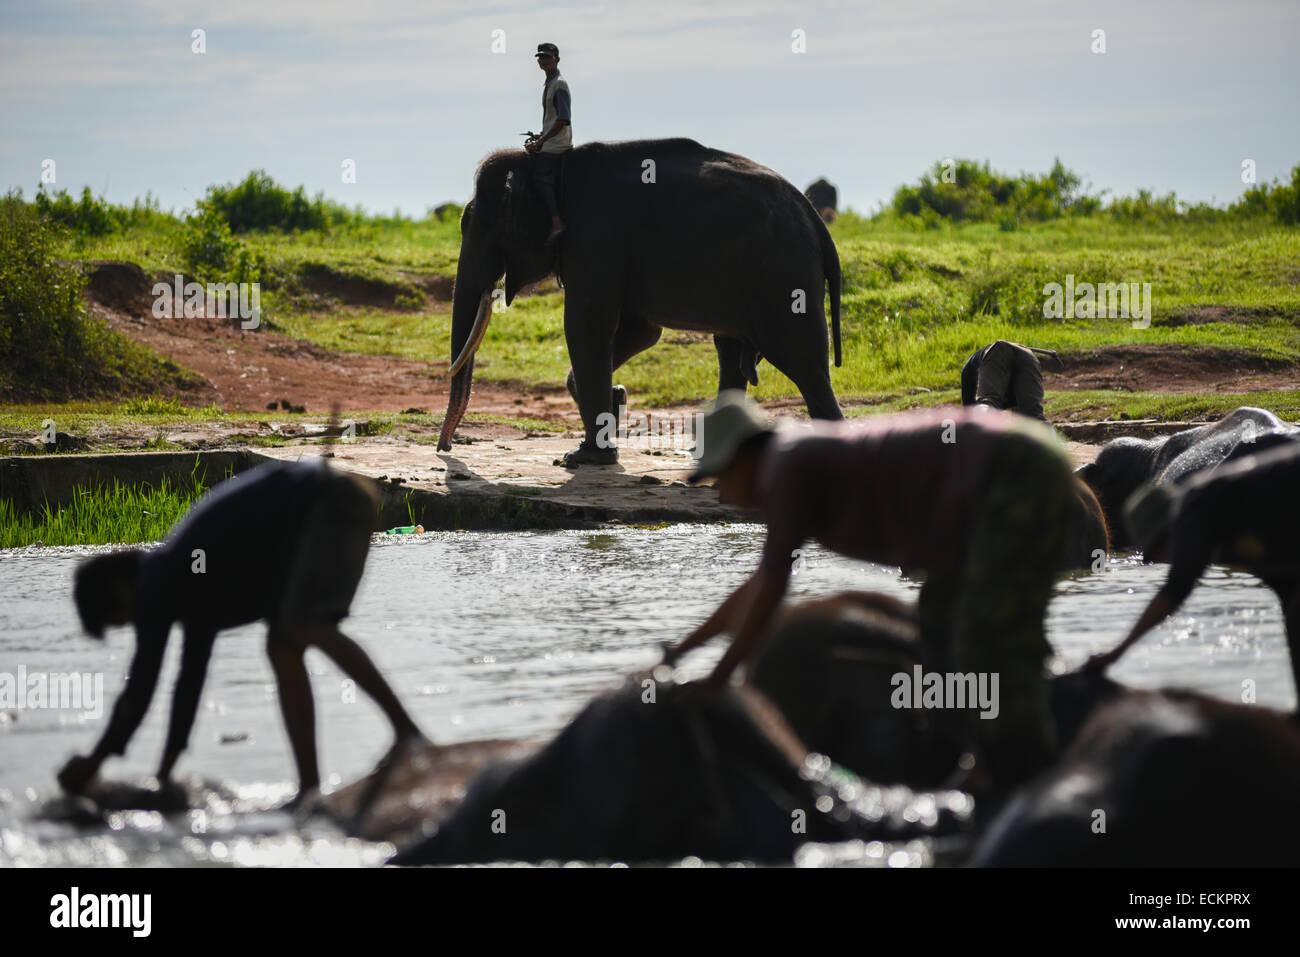 Mahouts bathe Sumatran elephants in Way Kambas National Park, Sumatra, Indonesia. © Reynold Sumayku - Stock Image